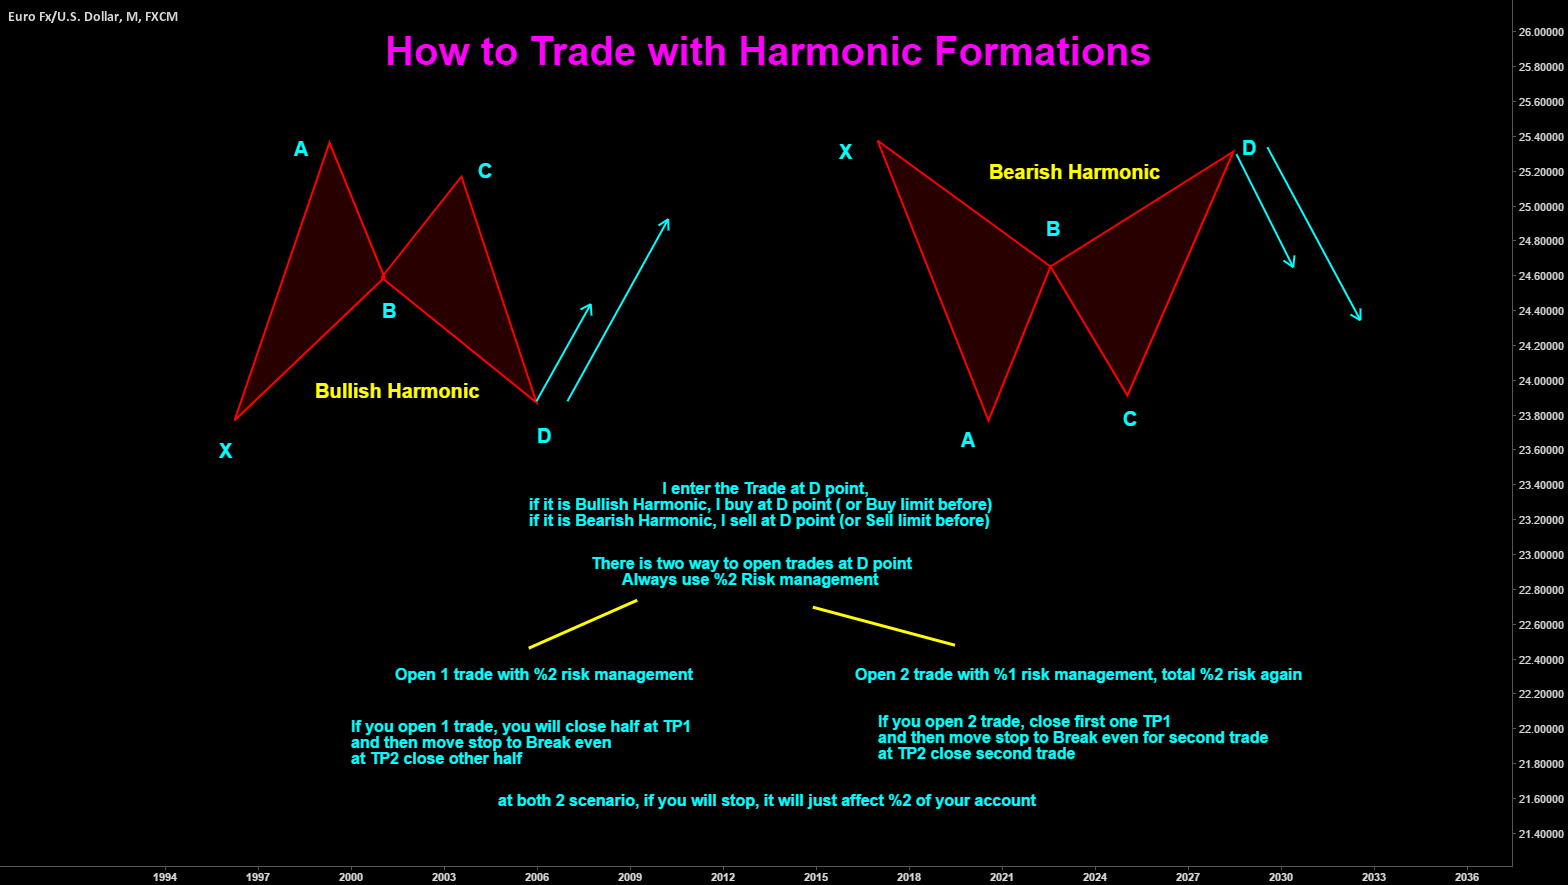 Harmonic Trading Scenarios